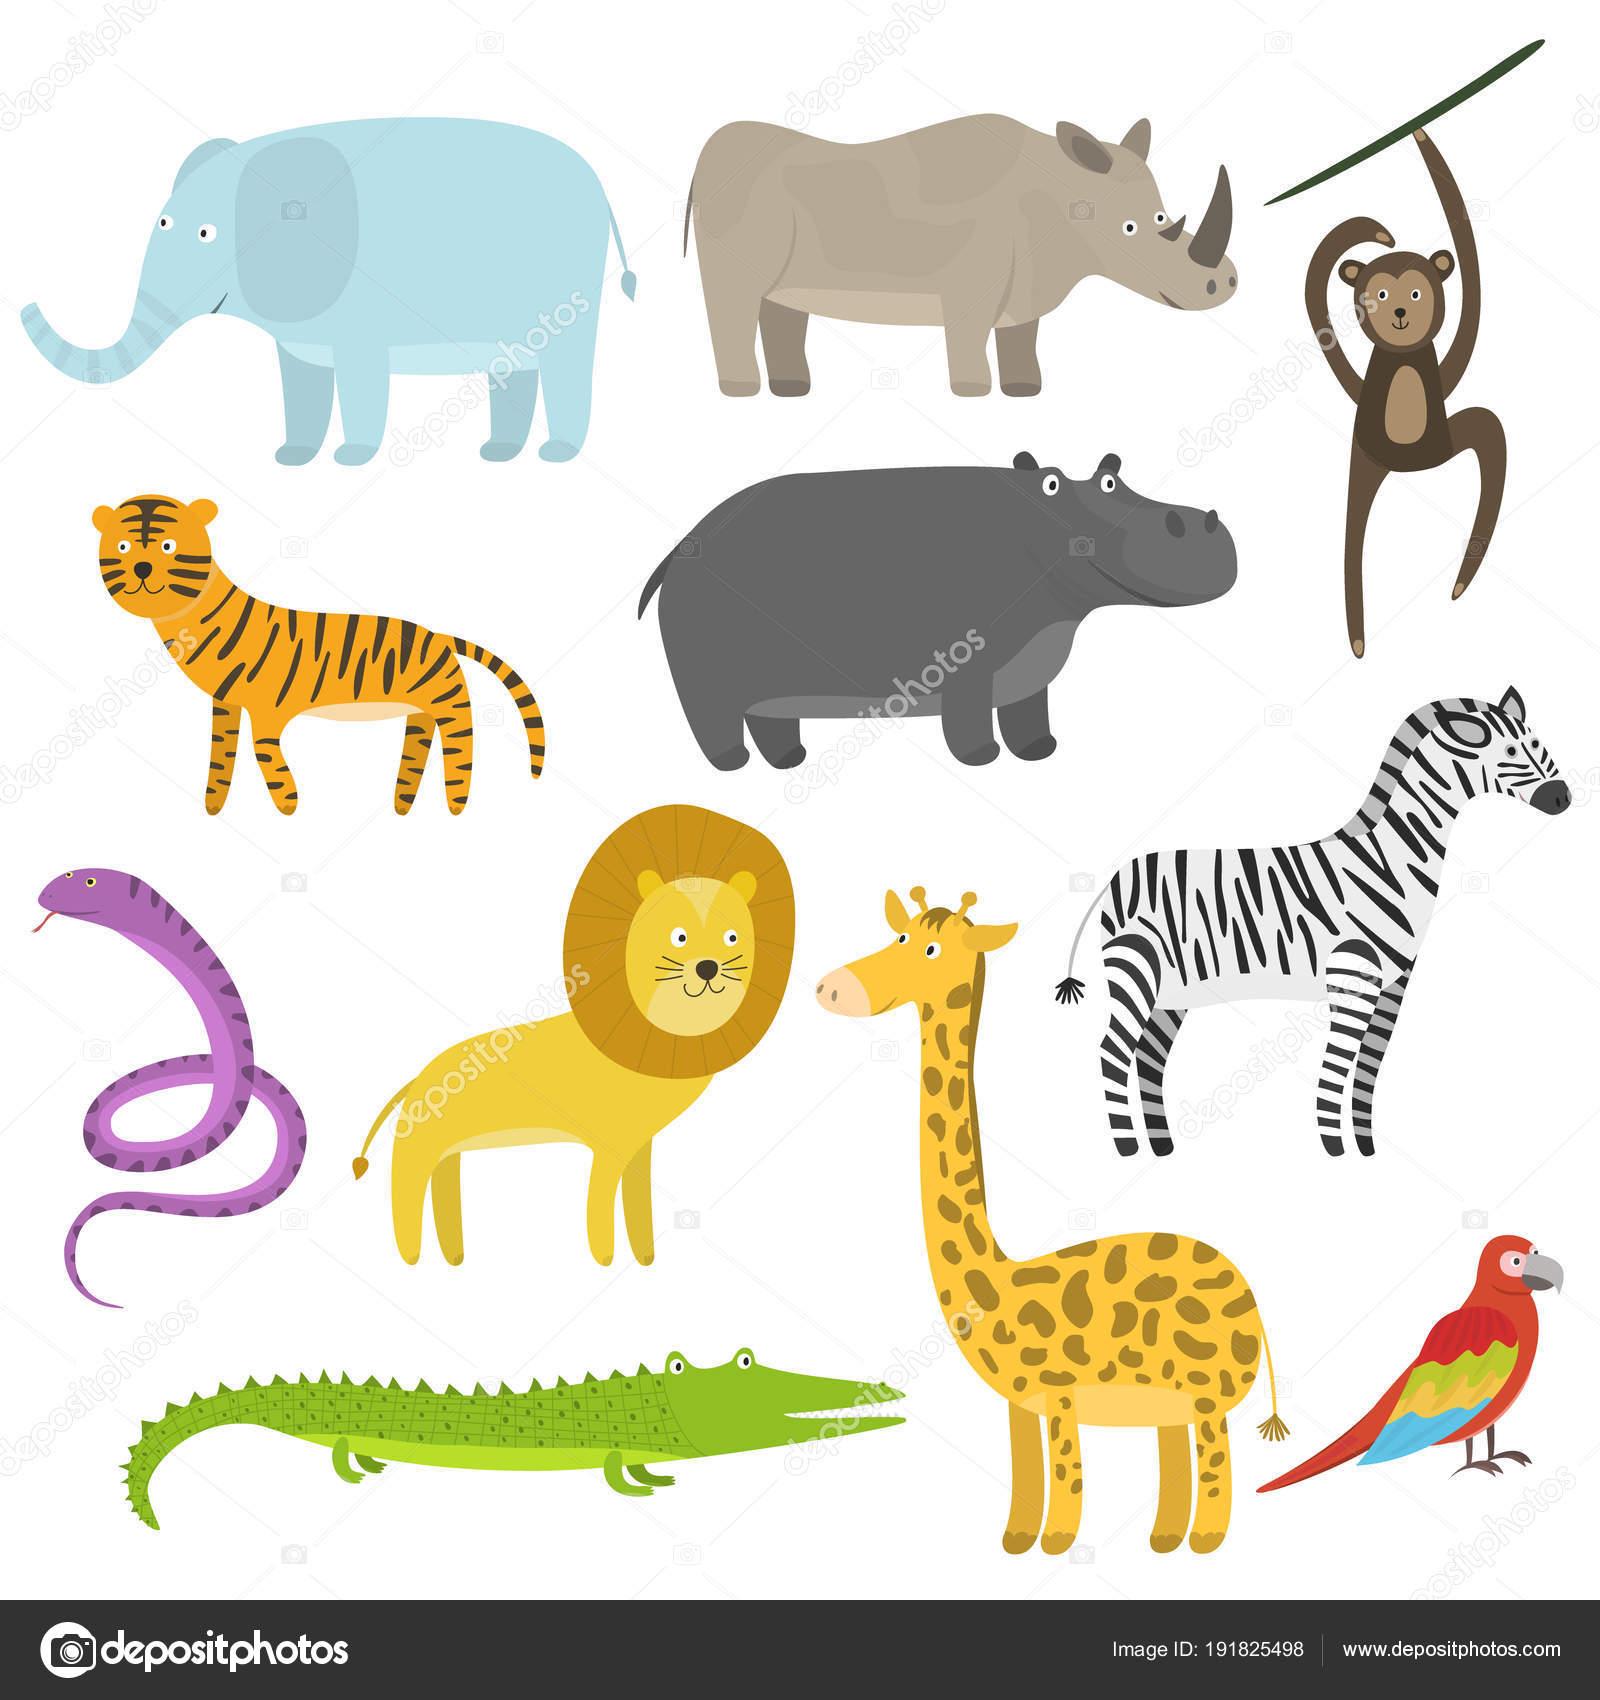 Dibujos Infantiles De Animales De La Selva Conjunto De Dibujos